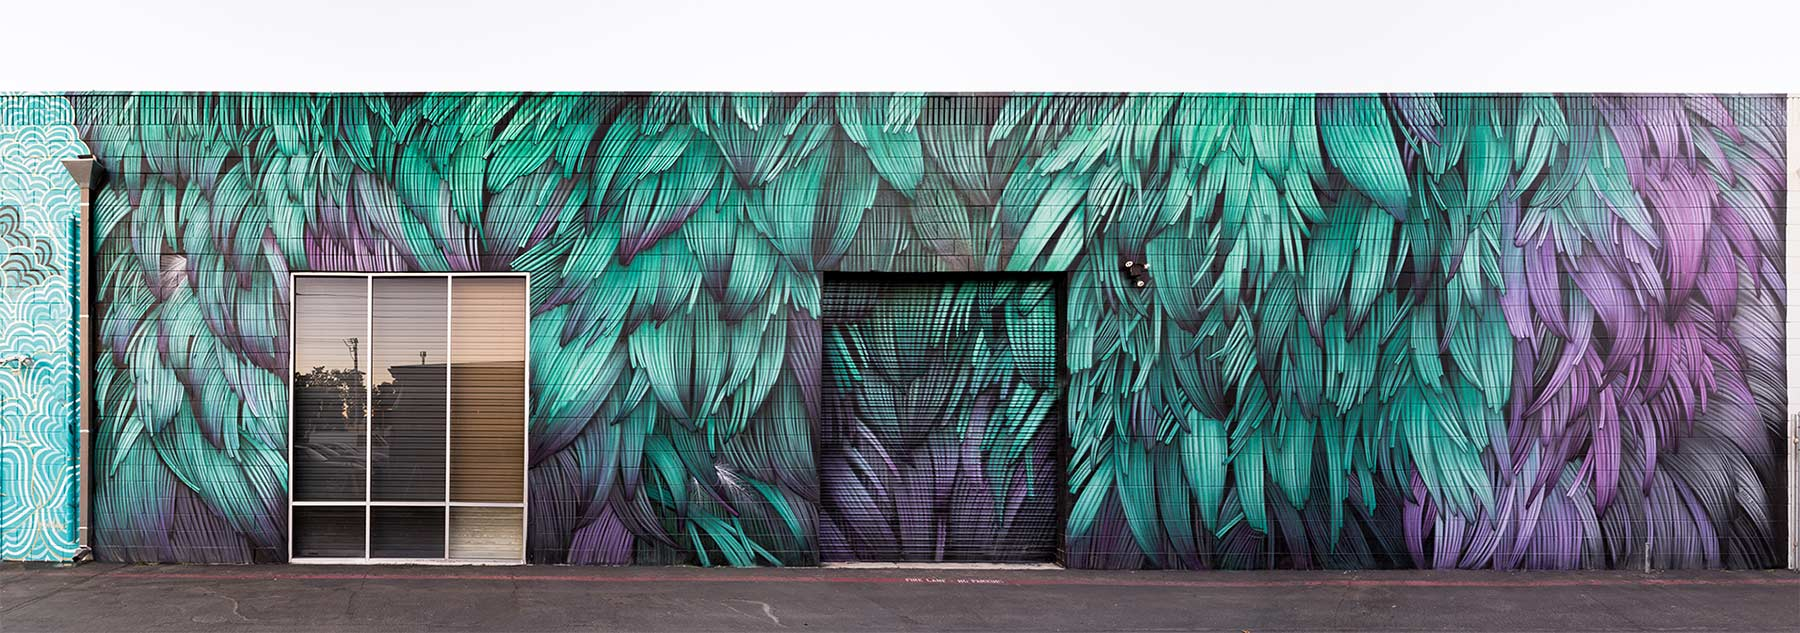 Street Art: Adele Renault Adele-Renault_05